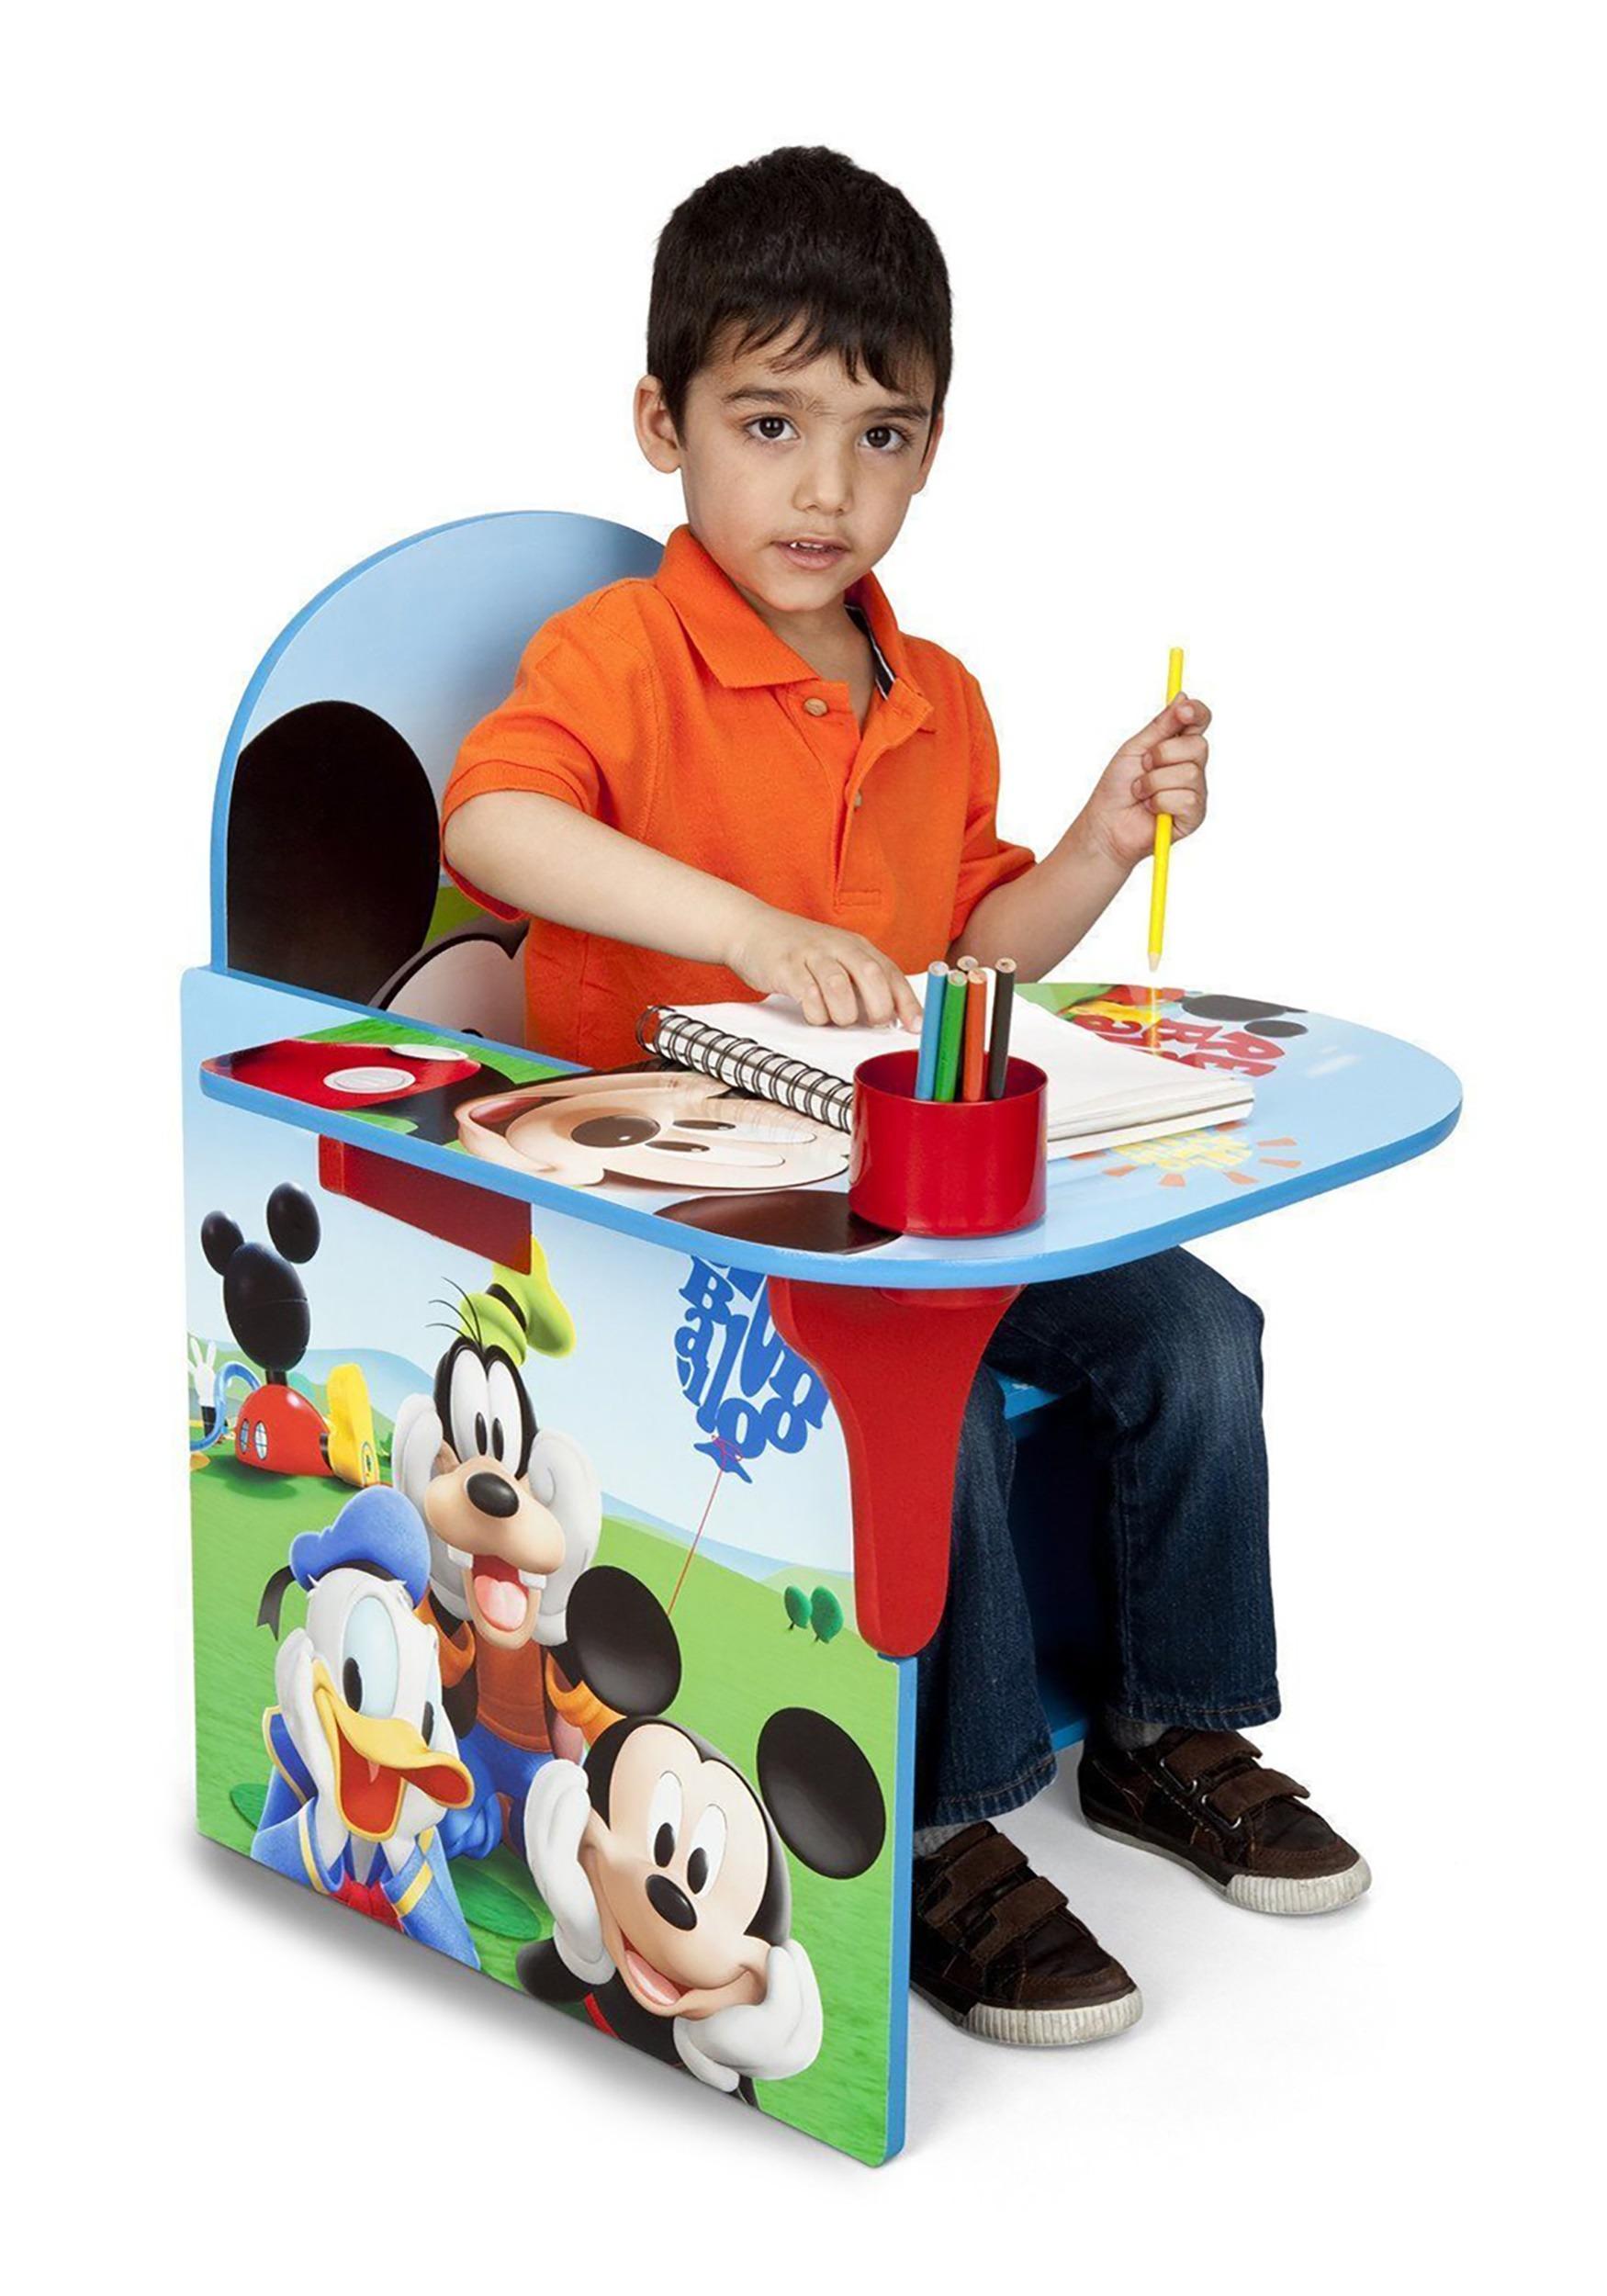 Phenomenal Mickey Mouse Chair Desk With Storage Bin Creativecarmelina Interior Chair Design Creativecarmelinacom